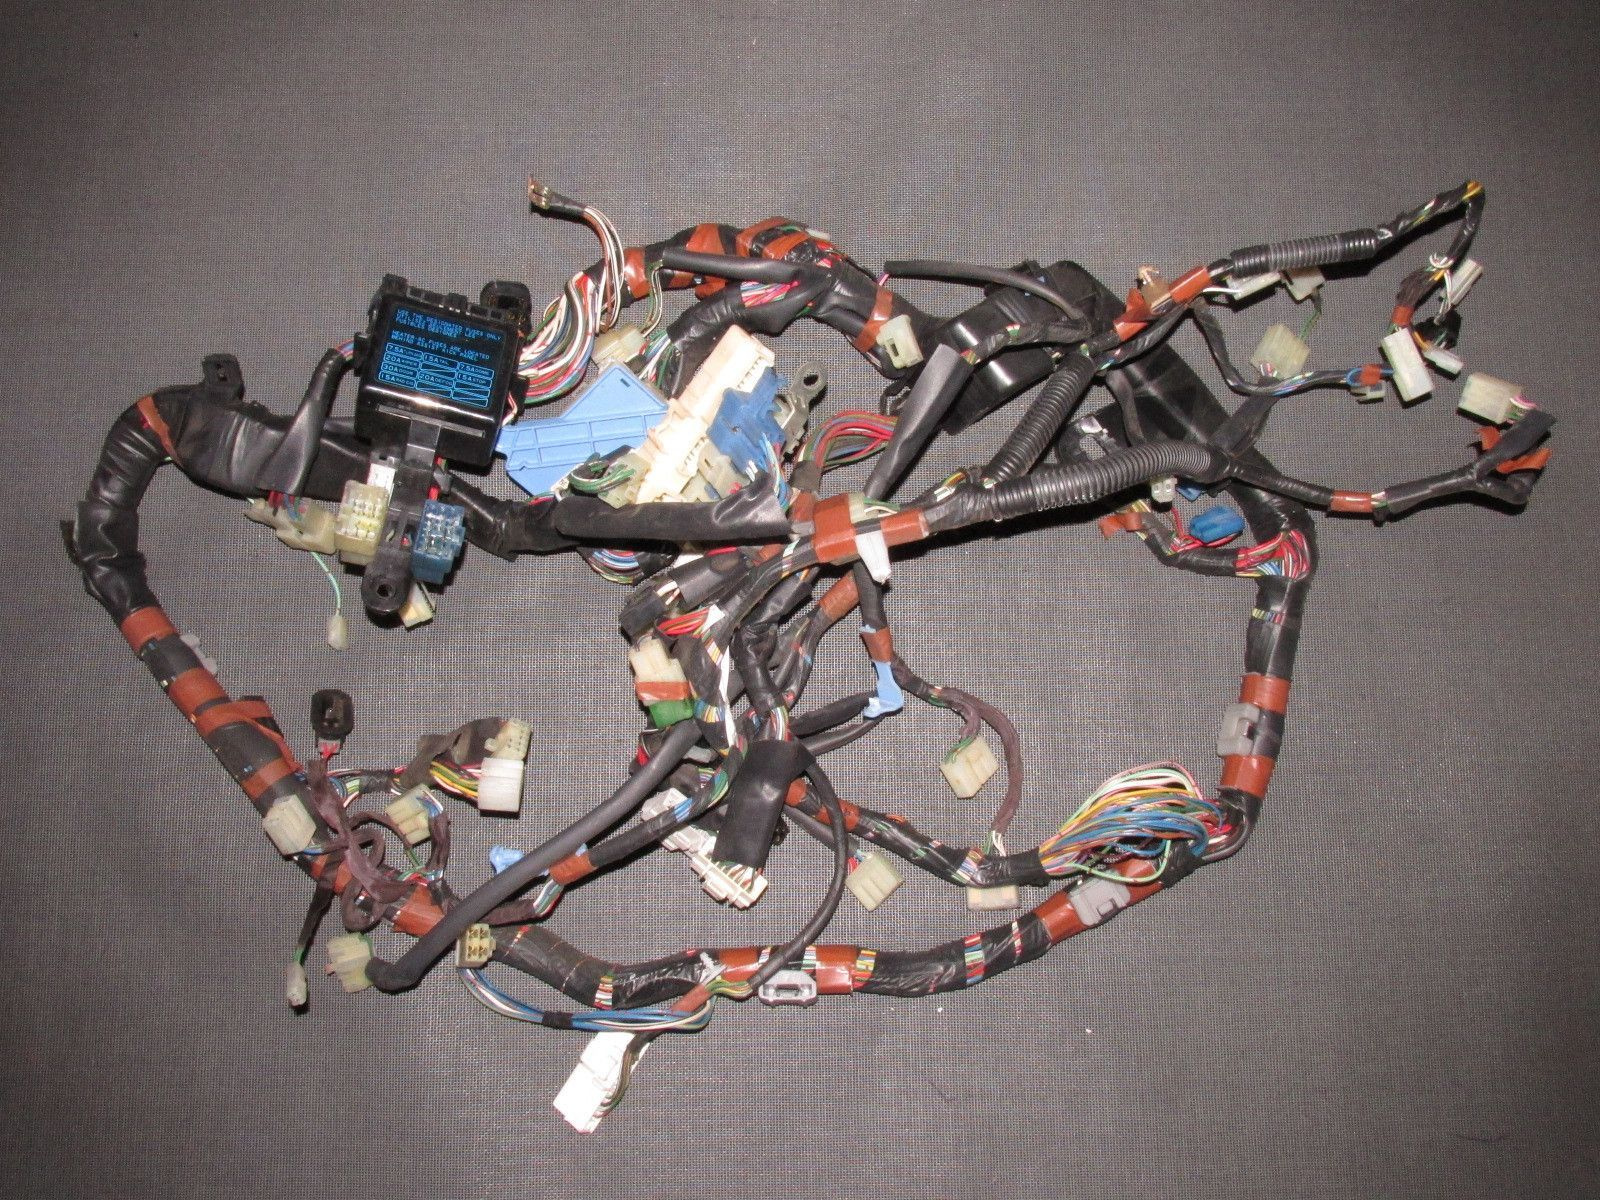 hight resolution of 85 86 87 88 89 toyota mr2 oem interior fuse box dash wiring harness